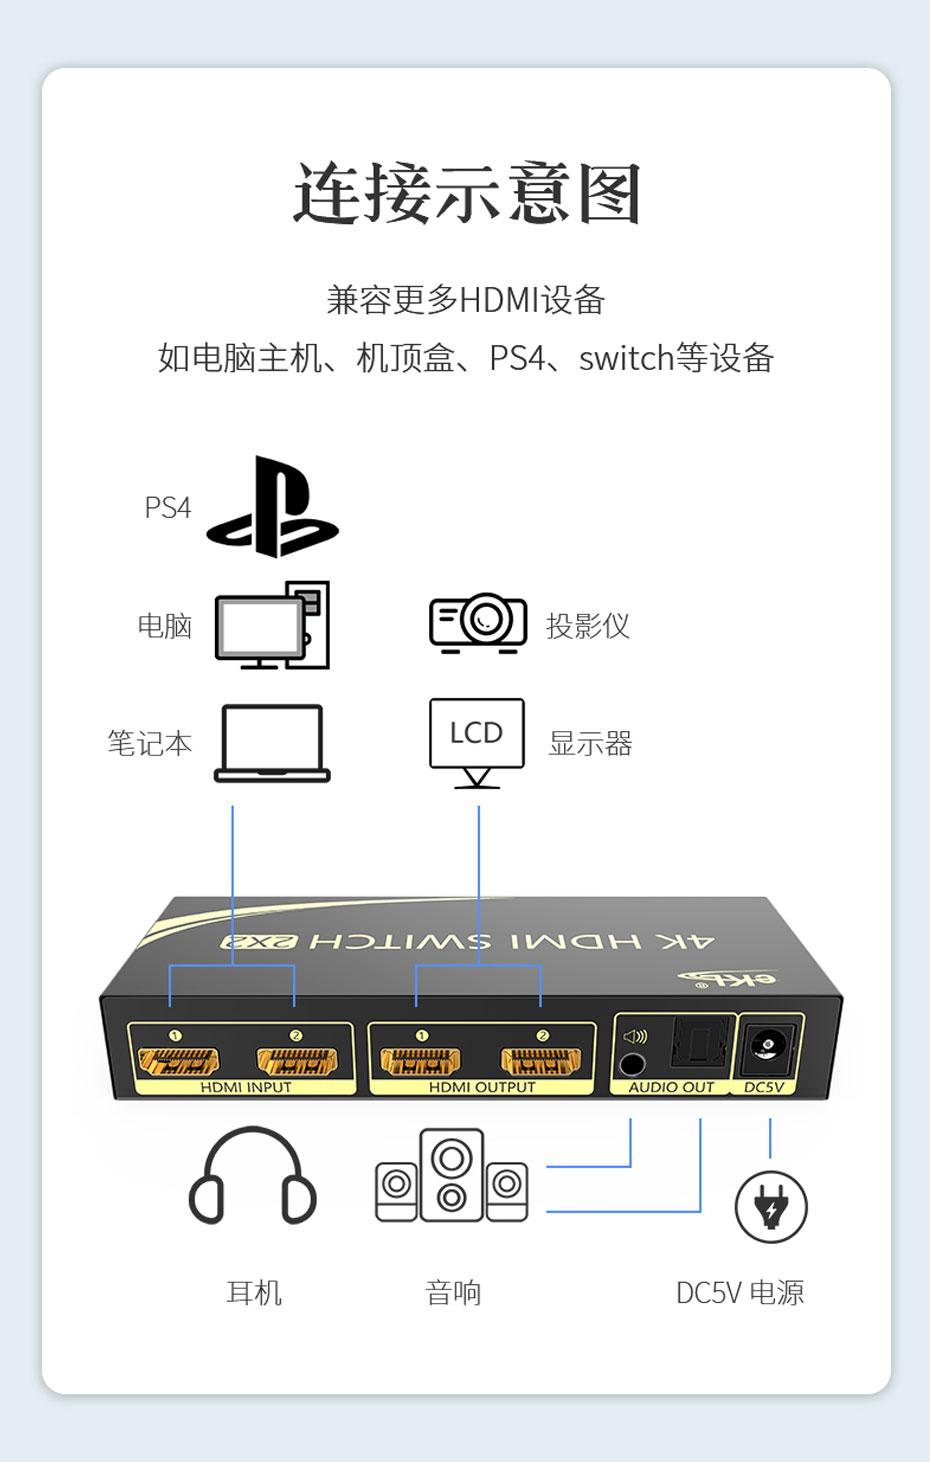 HDMI切换器2进2出212H连接使用示意图